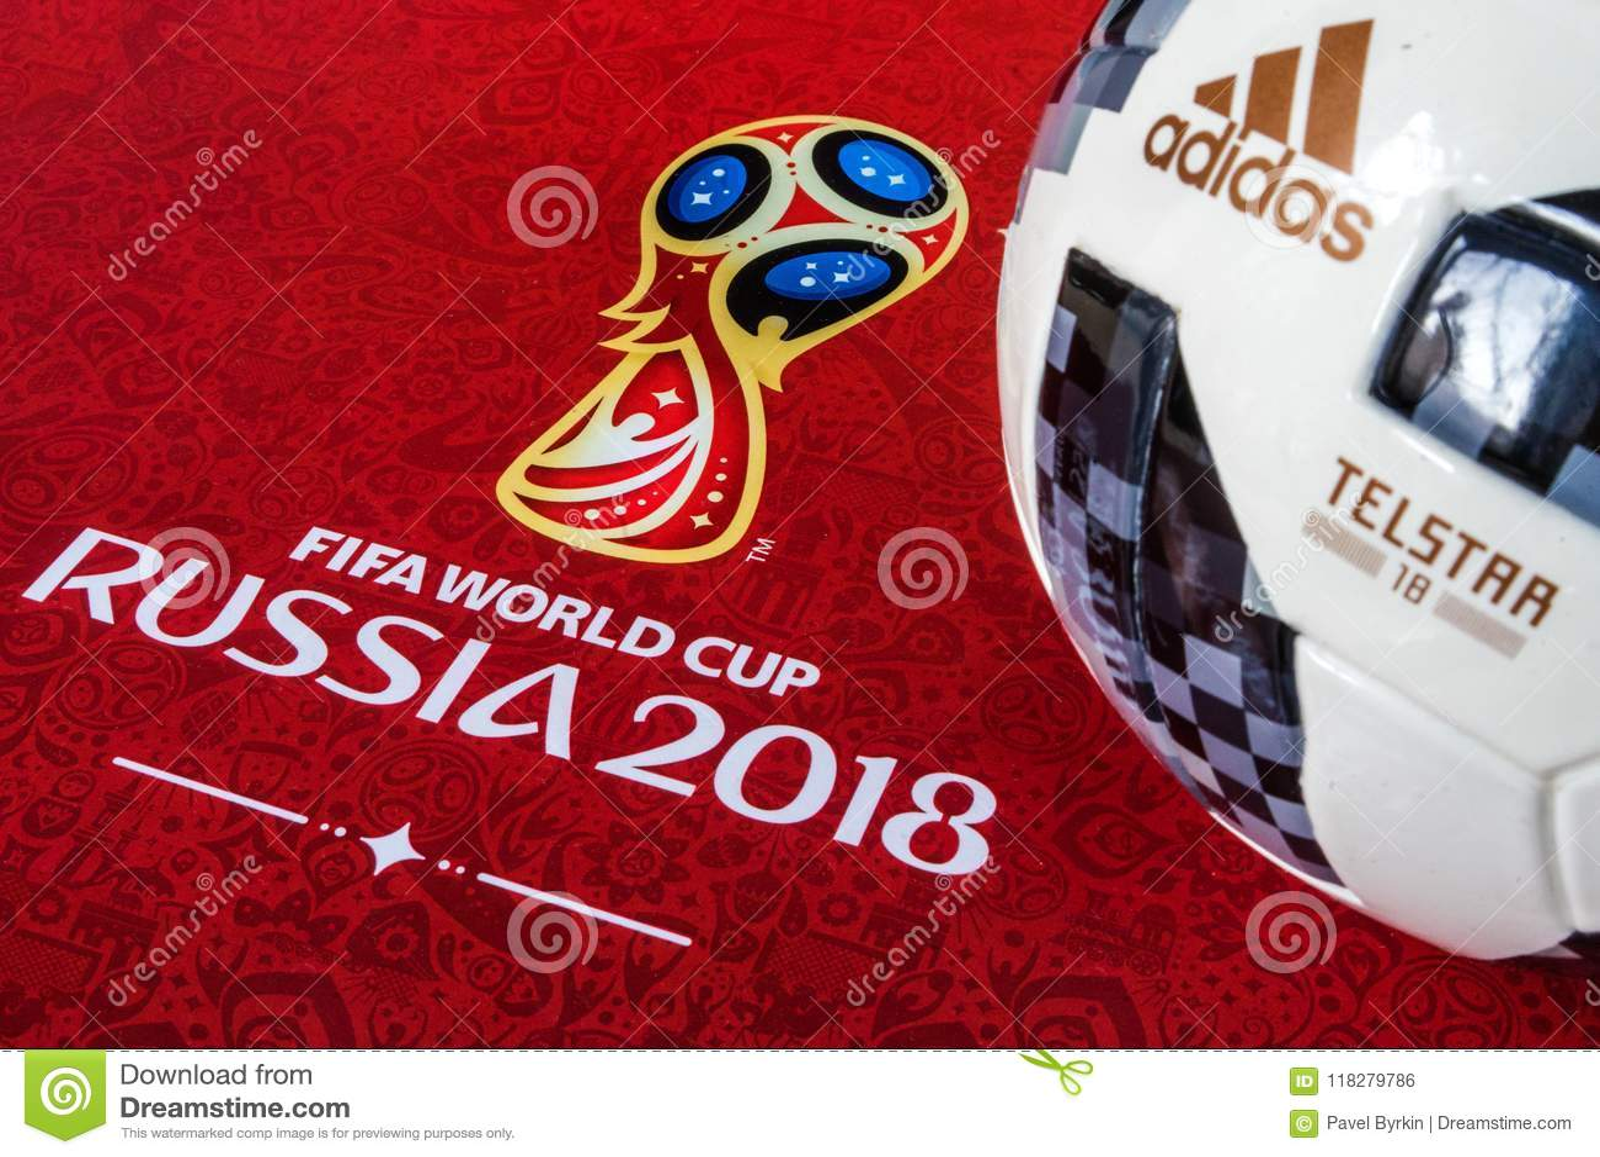 De Wereldbekertrofee van FIFA